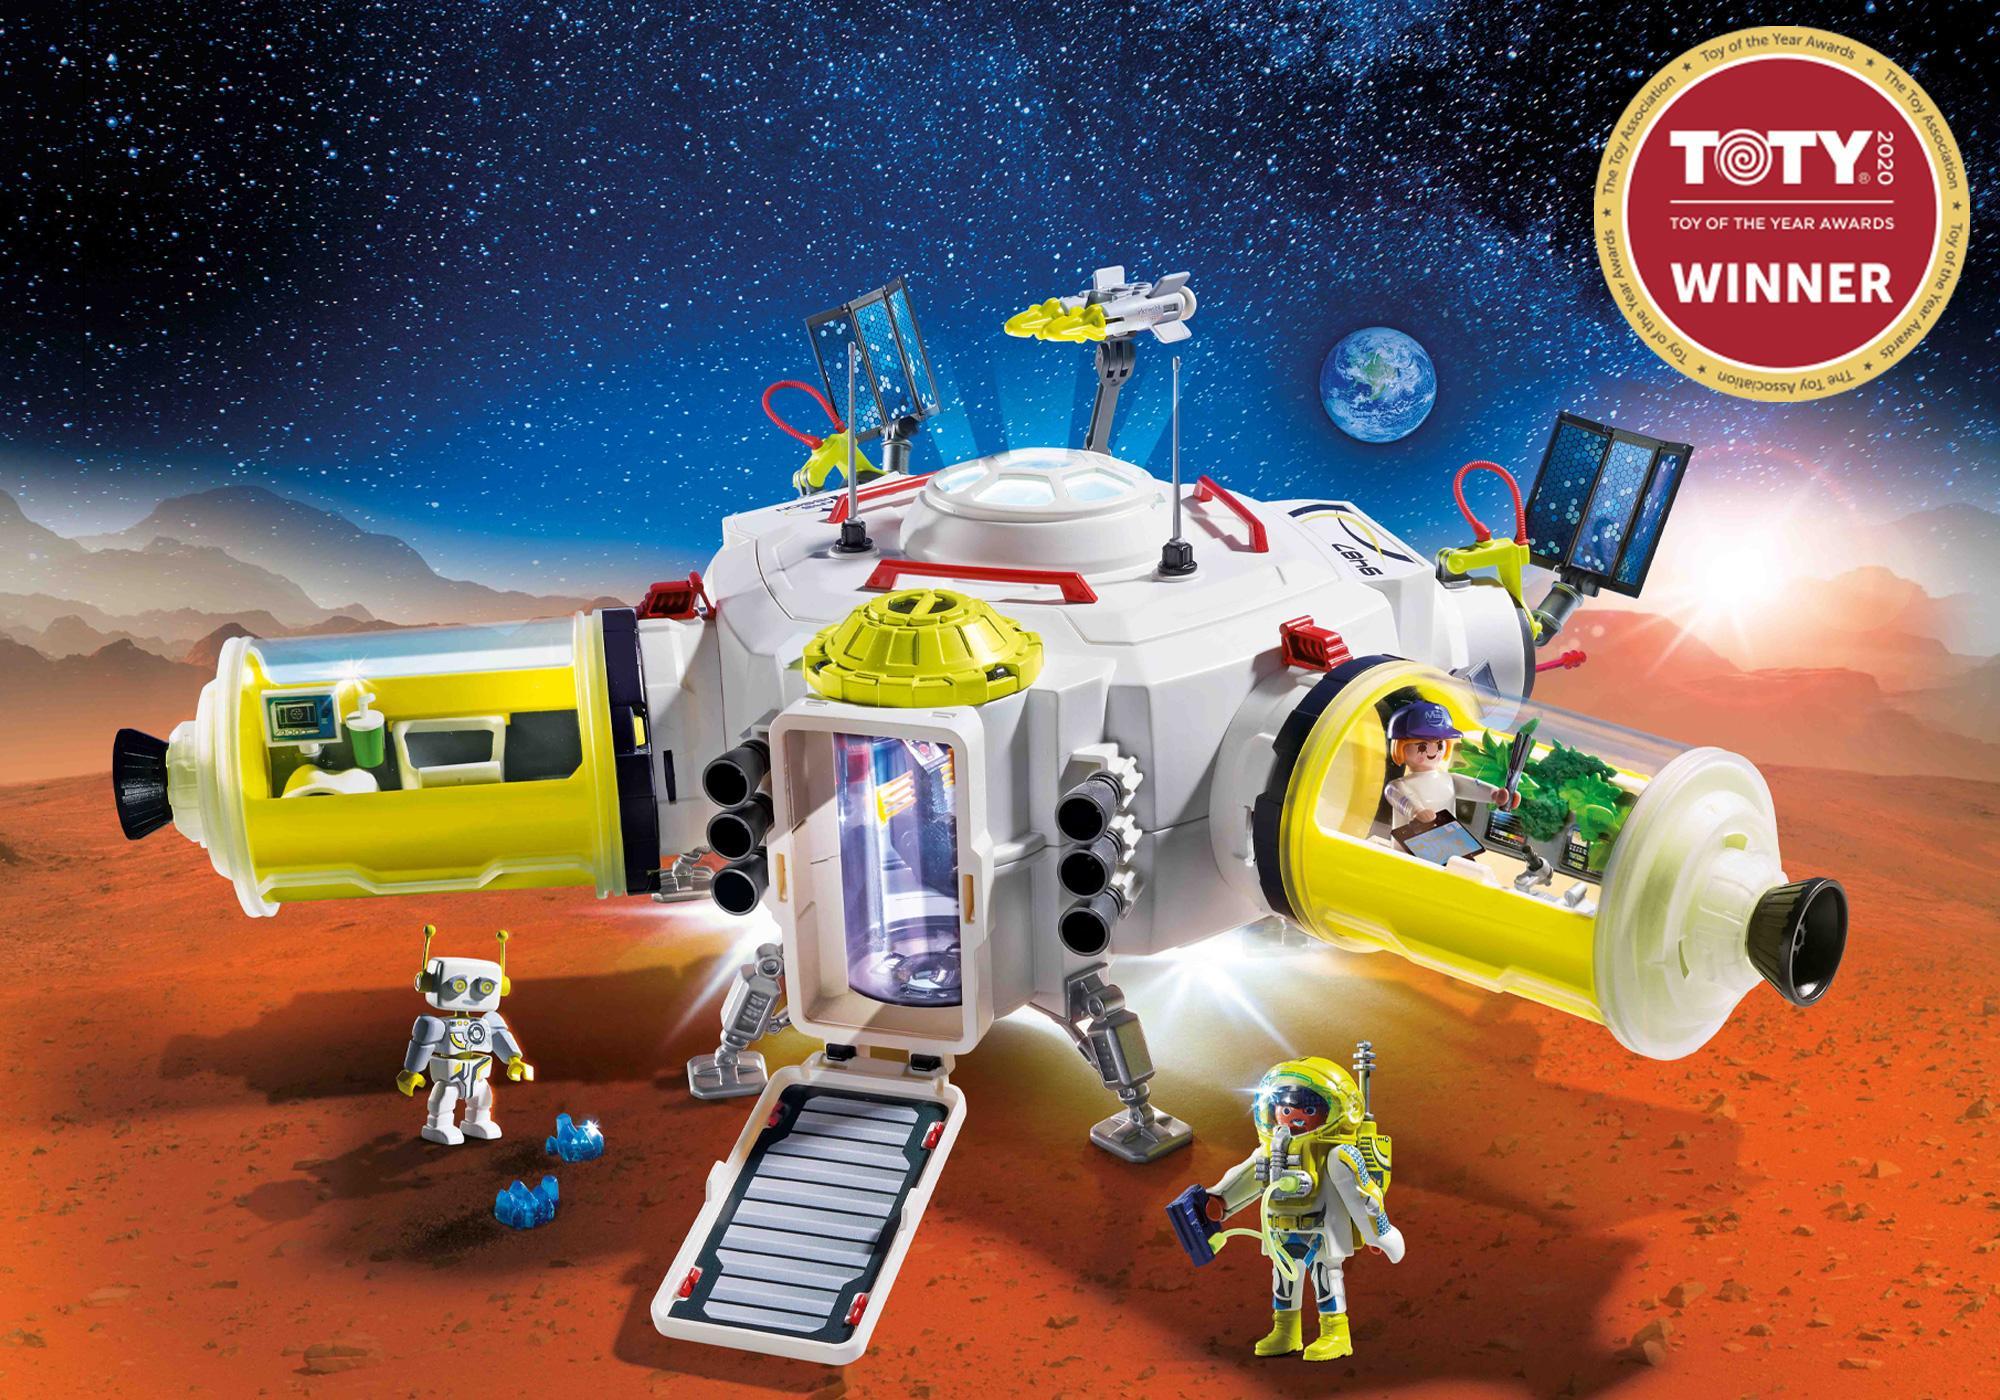 9487_product_detail/Διαστημικός Σταθμός στον Άρη